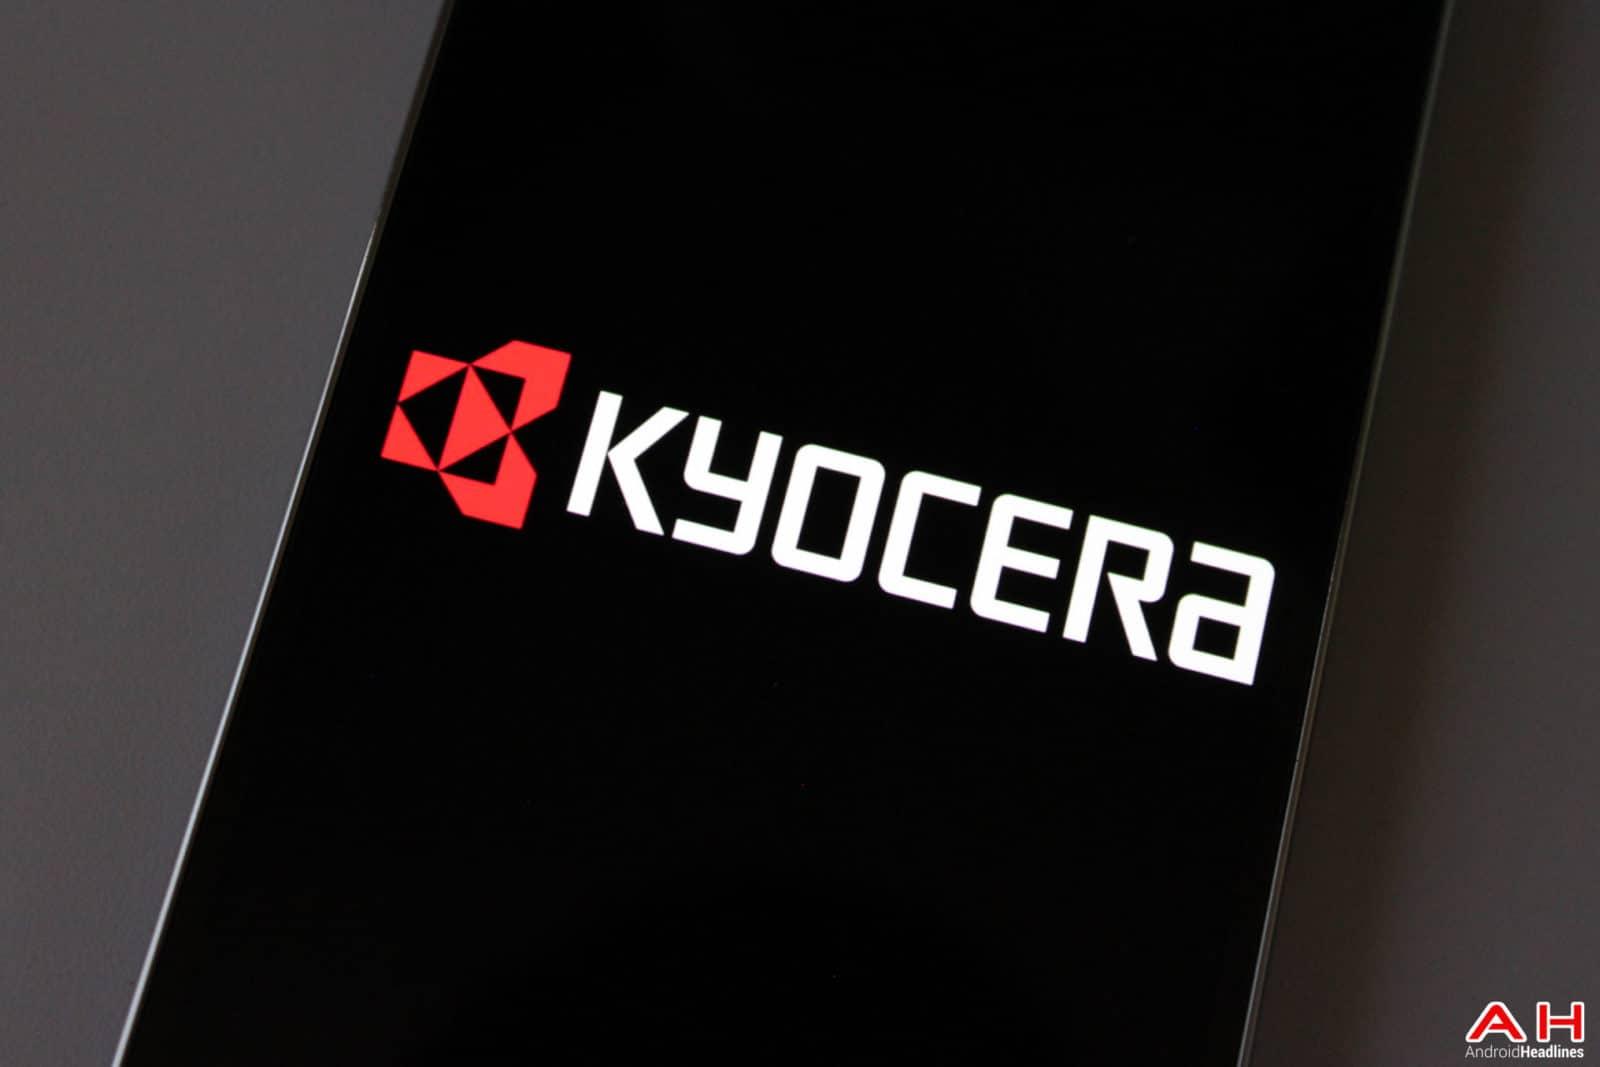 AH Kyocera LOGO-11